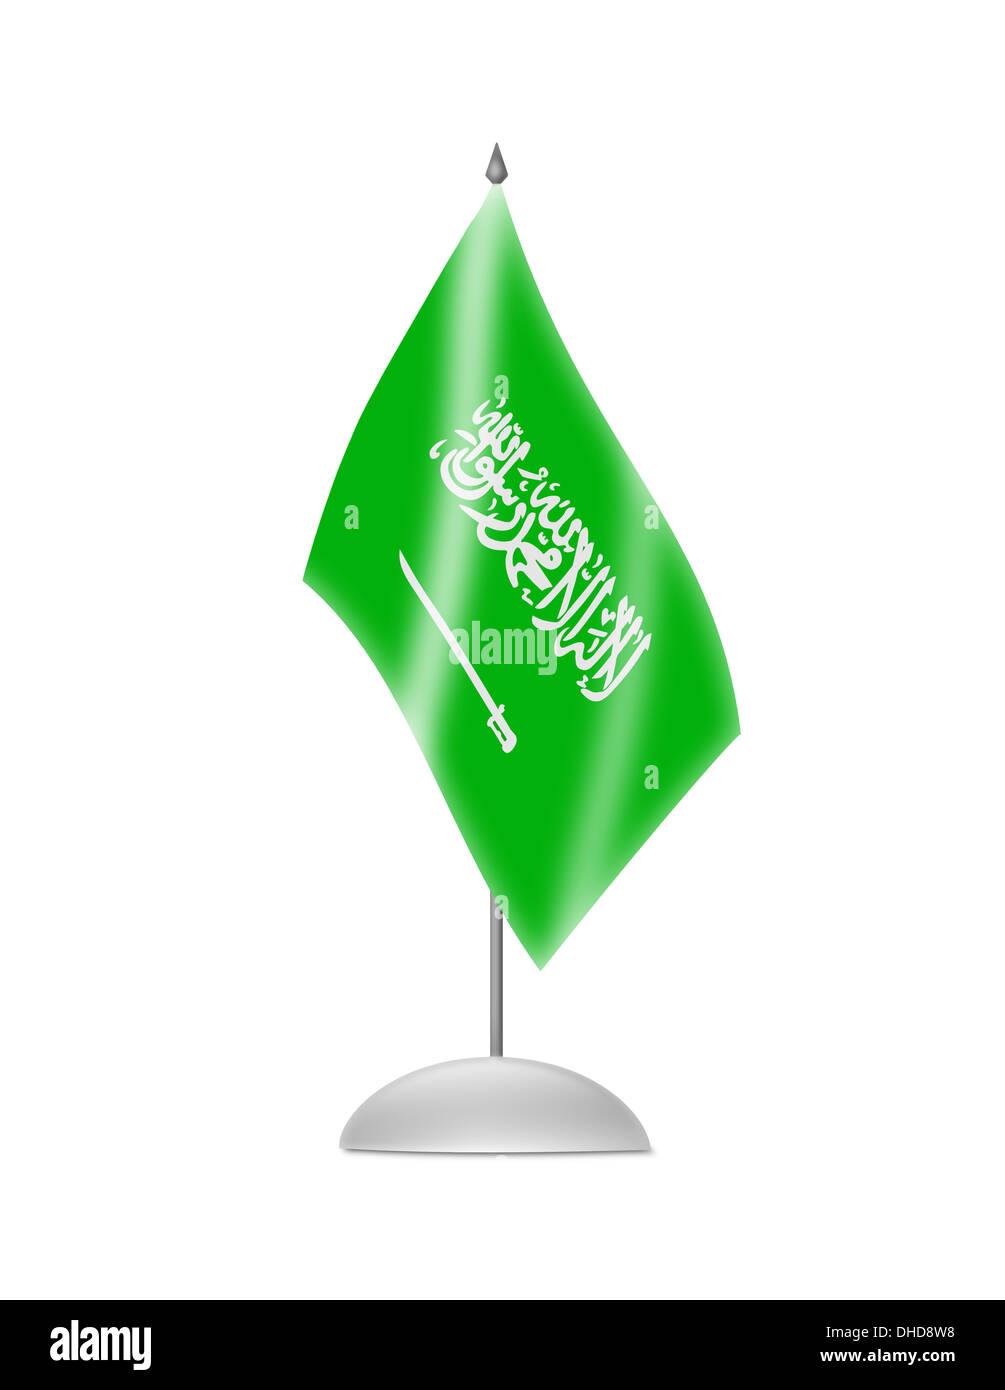 The Saudi Arabia flag - Stock Image